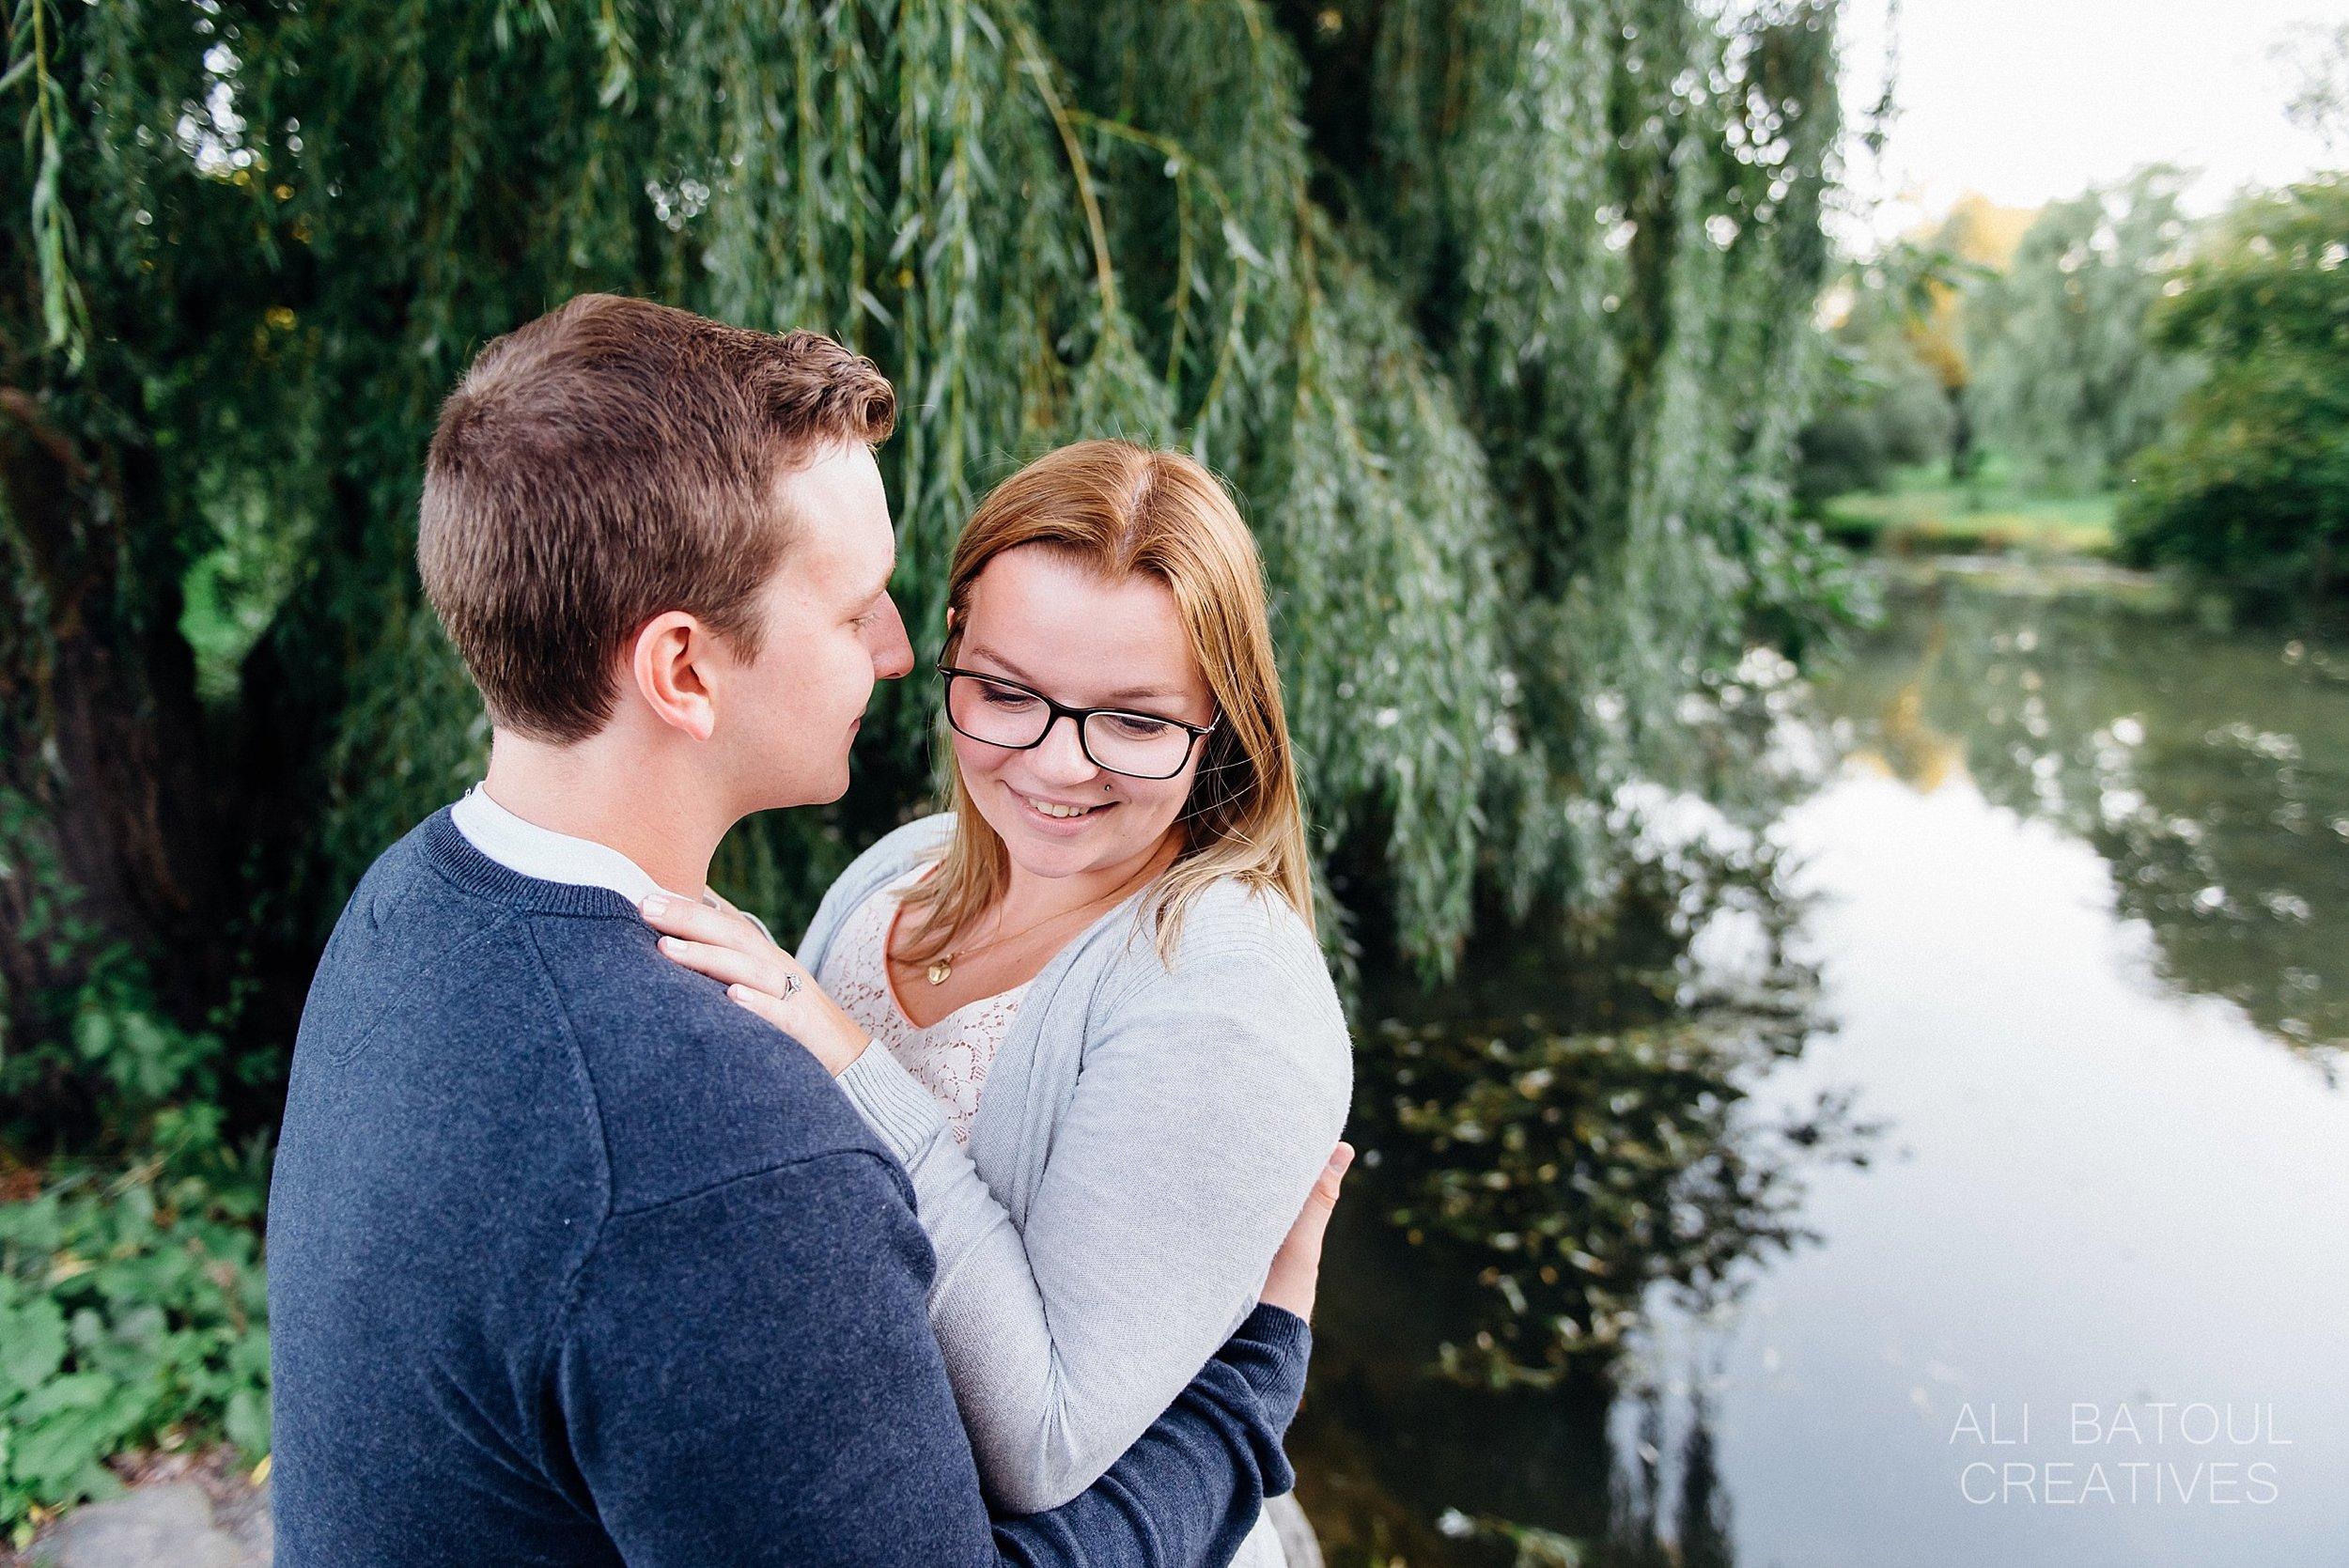 Natasha + Rich Ottawa Arboretum Engagement Photos - Ali and Batoul Fine Art Wedding Photography_0041.jpg